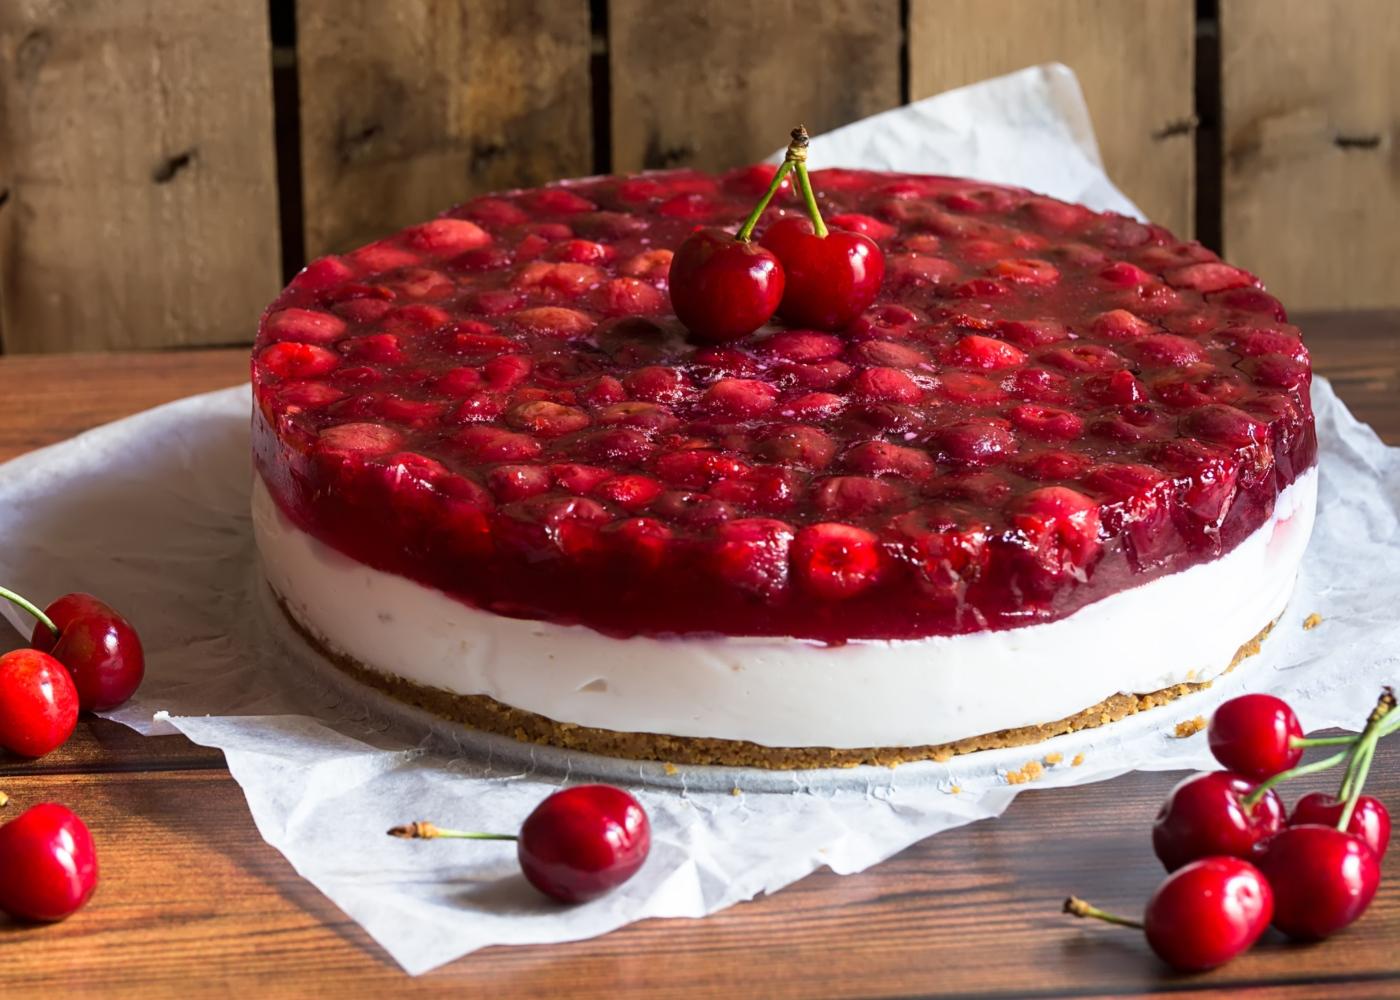 Cheesecake de cereja fresca